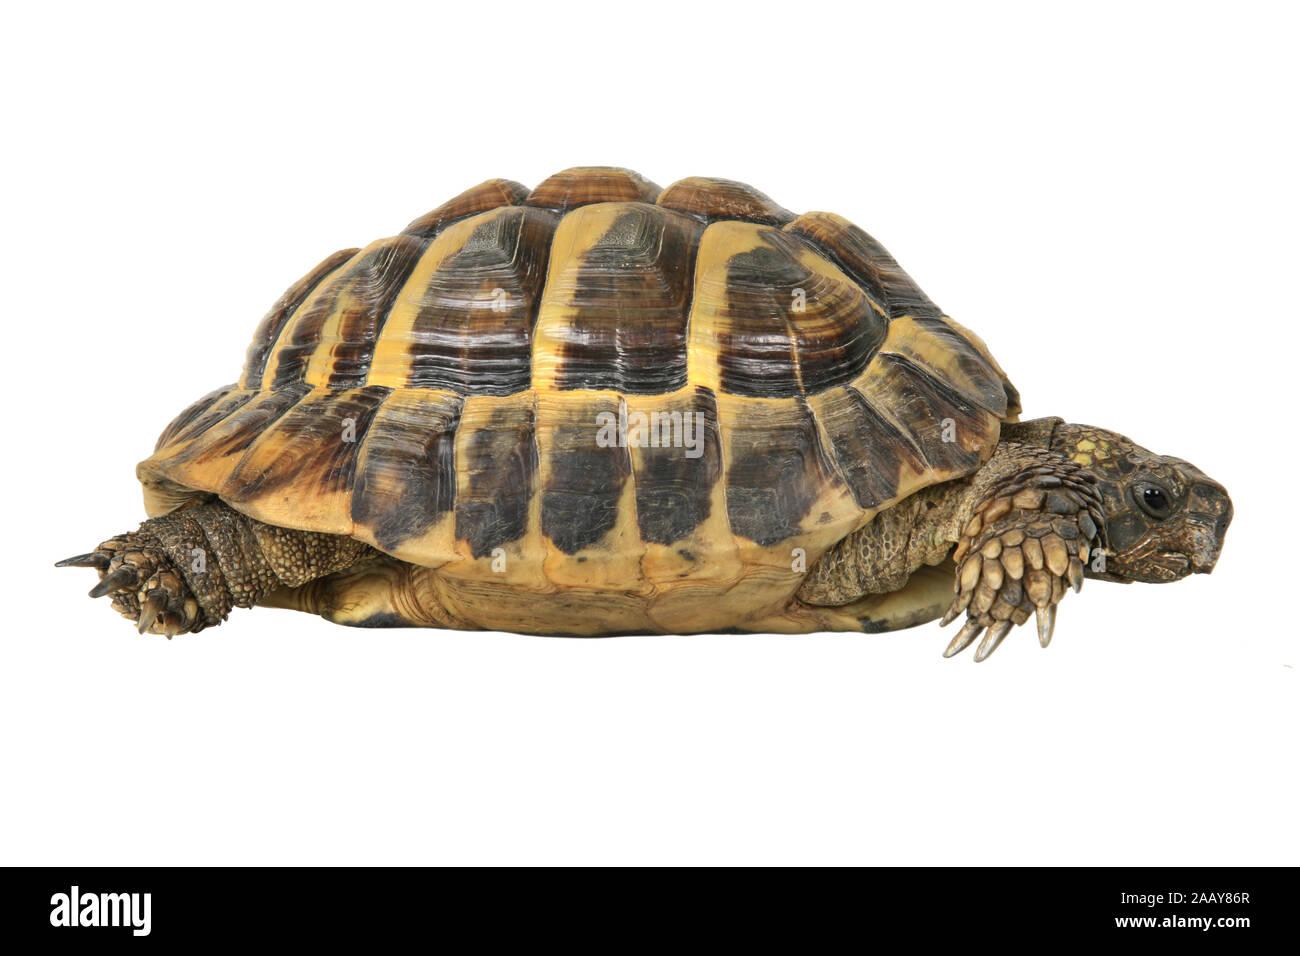 Griechische Landschildkroete, Boettgers Landschildkroete (Testudo hermanni boettgeri), Seitenansicht | Hermanns tortoise, Greek tortoise, Boettgers to Stock Photo